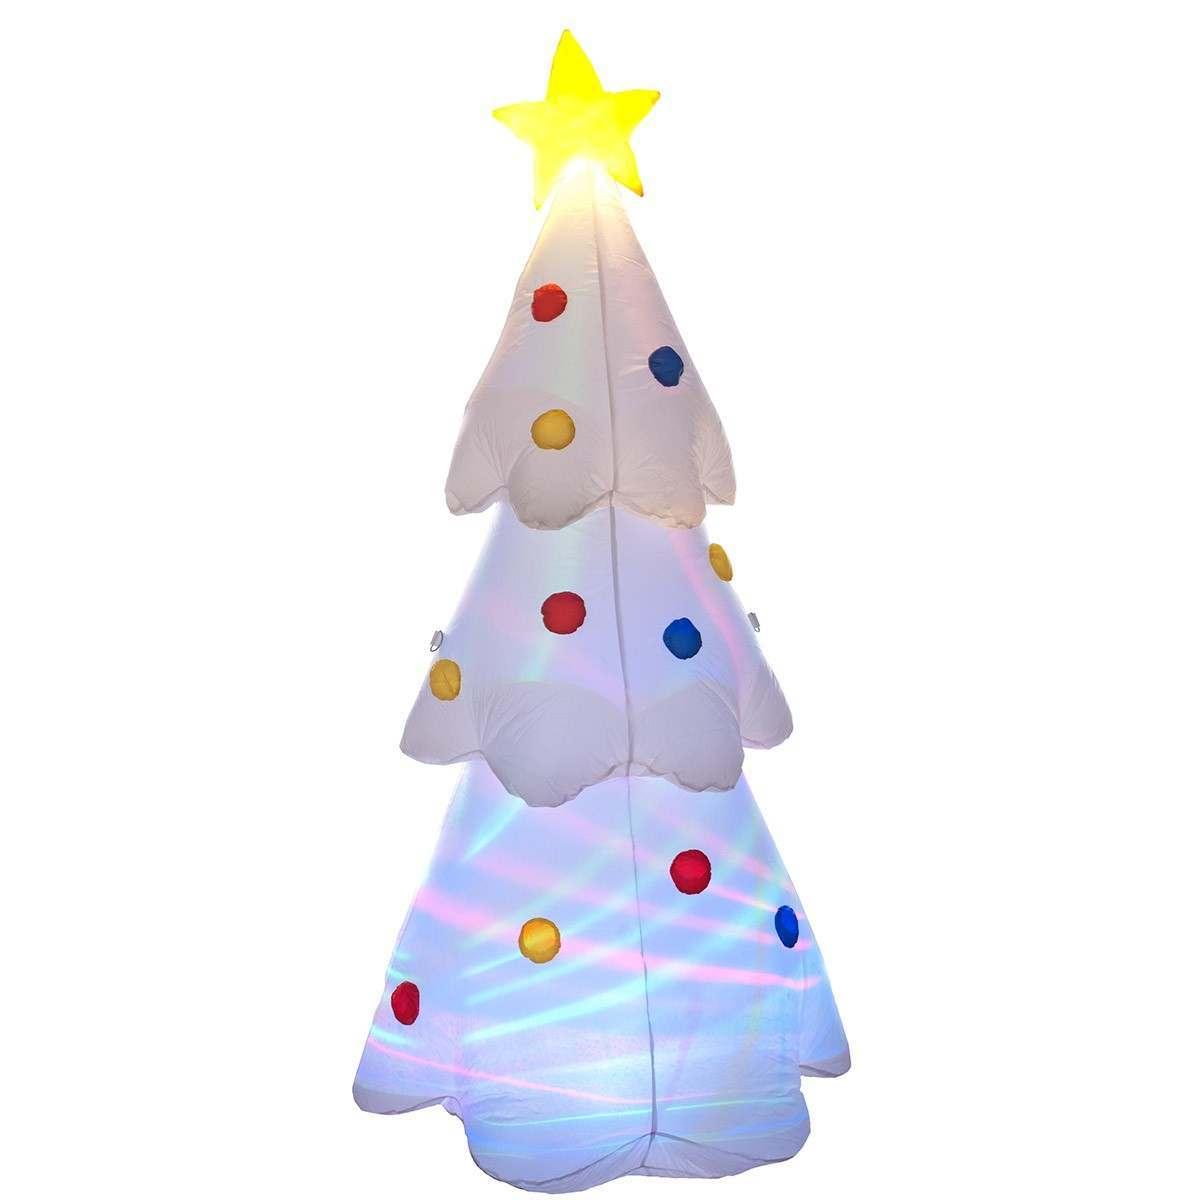 6ft White Inflatable Disco Lights Christmas Tree Figure